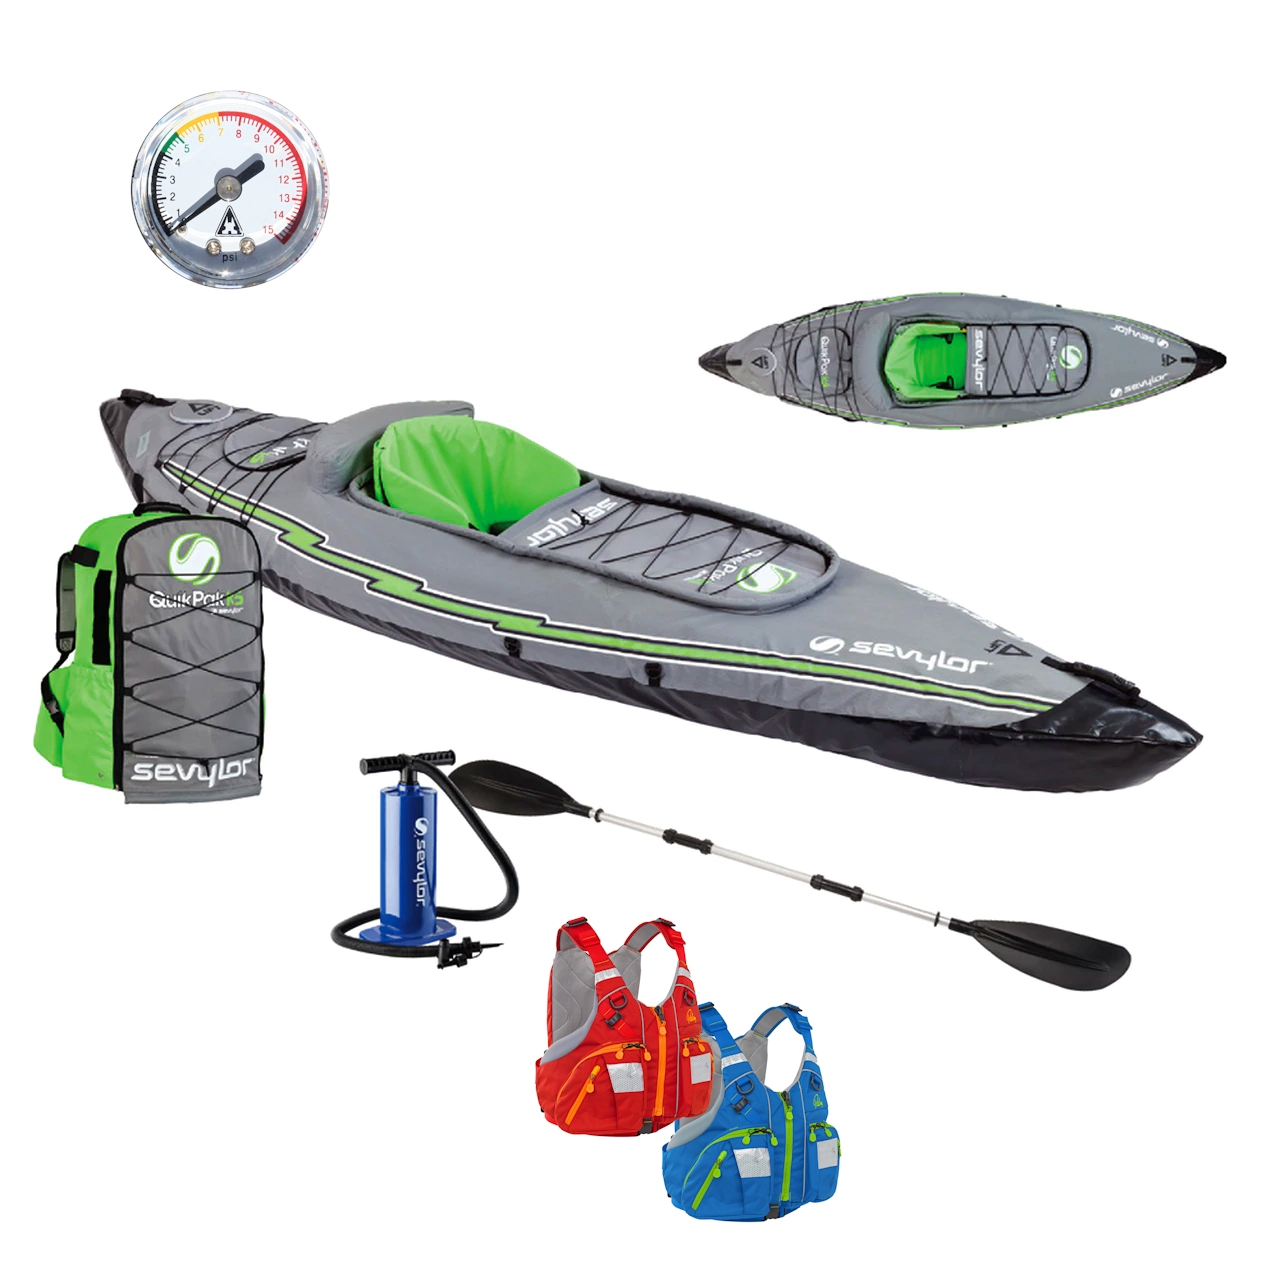 Equipment for inflatable kayaks